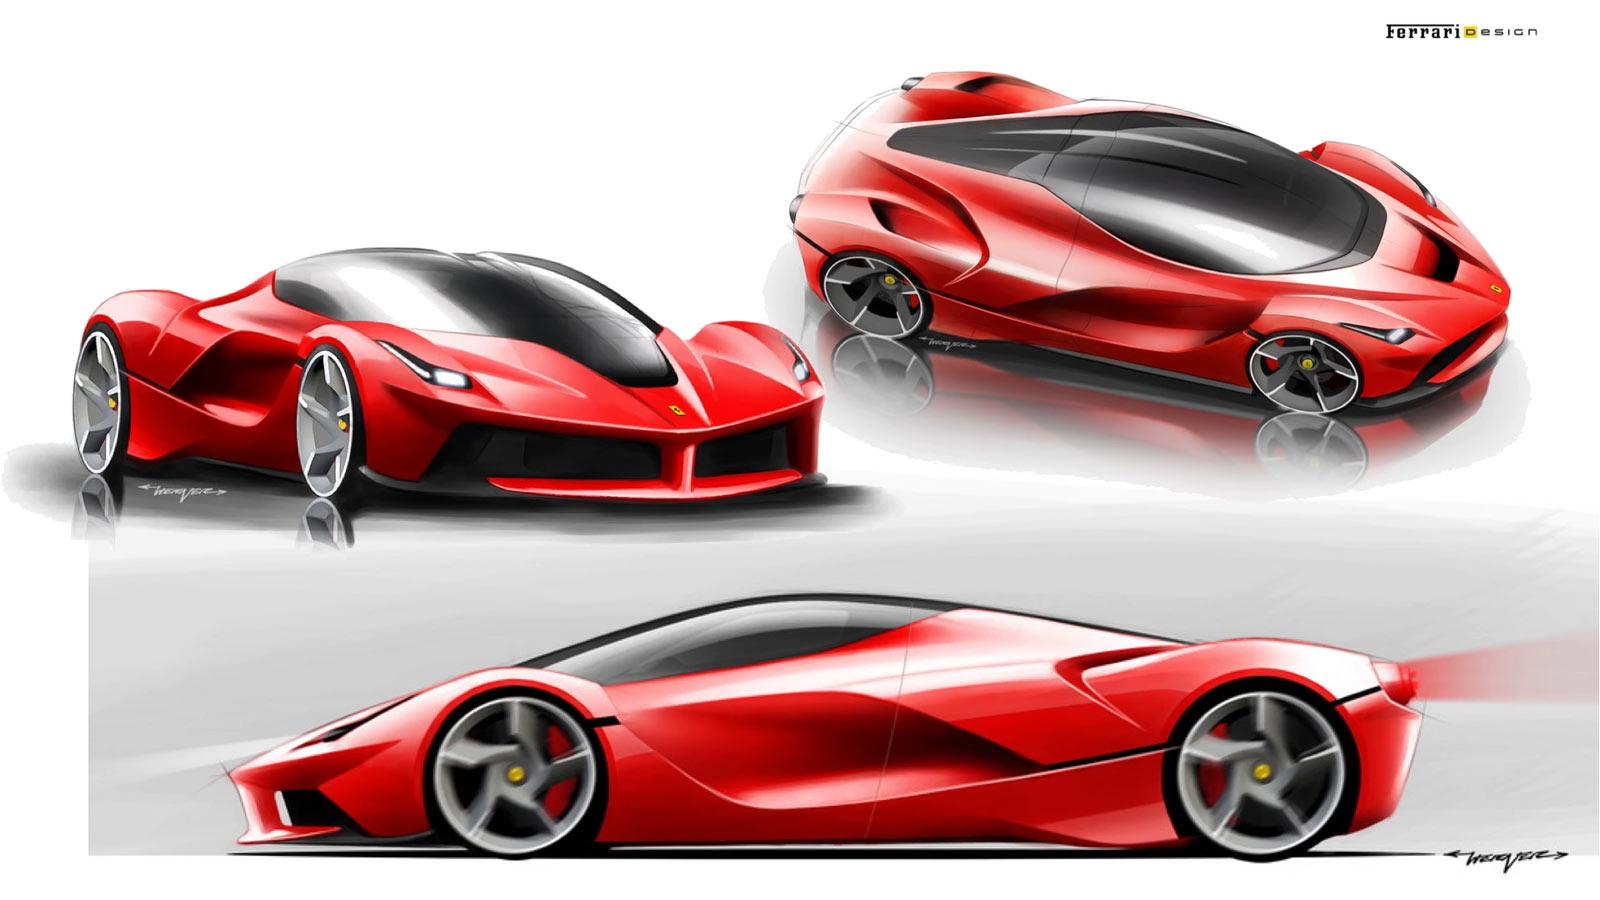 Ferrari458 Italia Design Sketch - Car Body Design |Ferrari Design Sketches